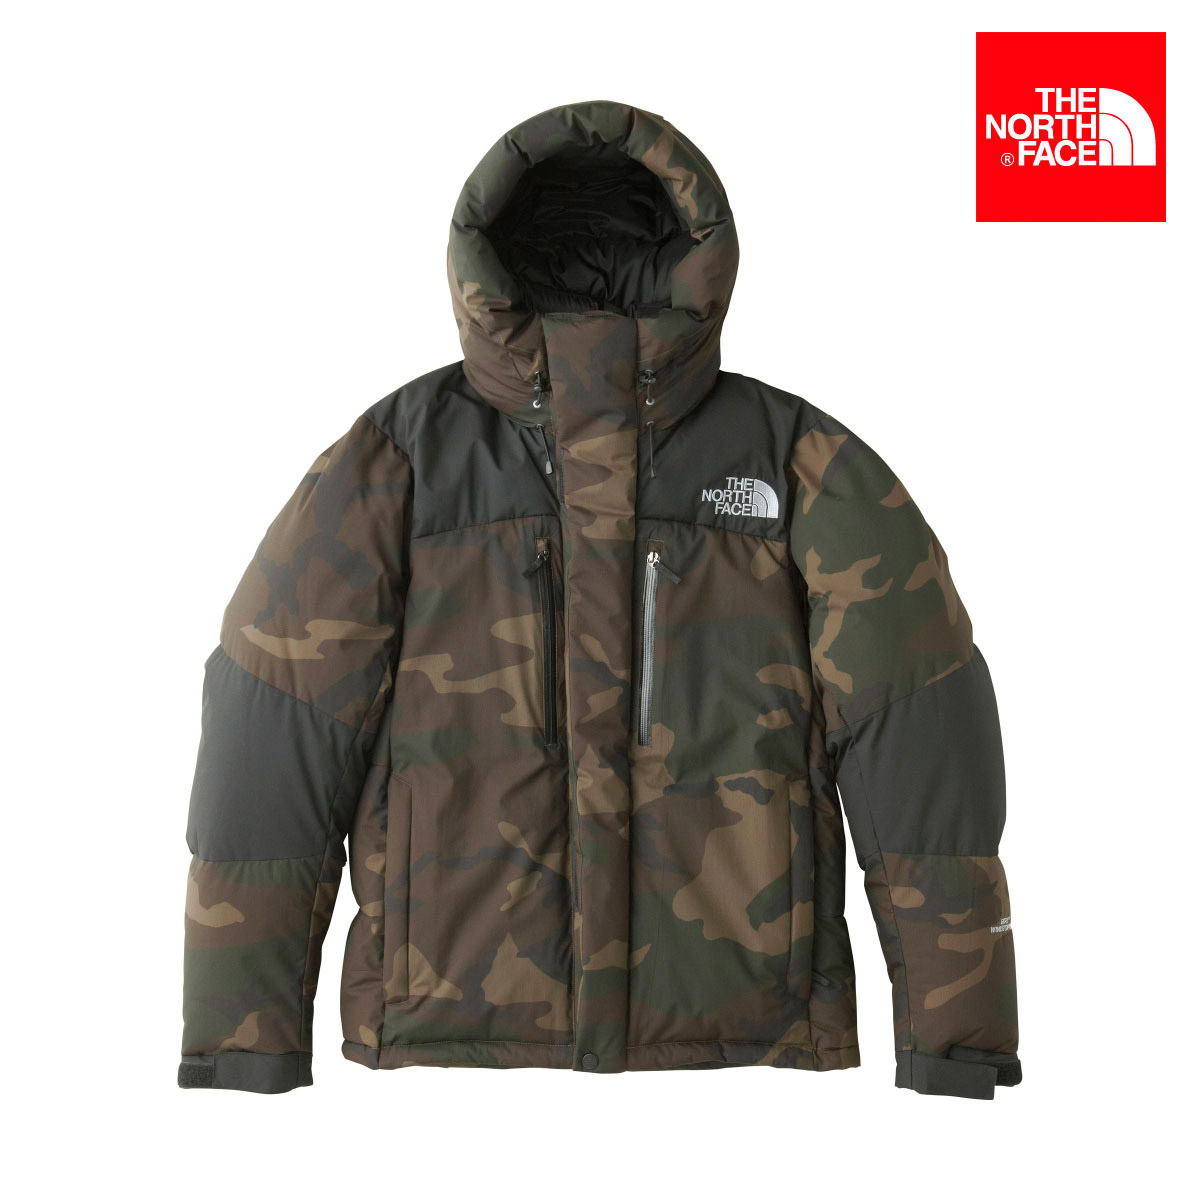 67b9c86cf THE NORTH FACE NV BALTRO LT JKT (the North Face novelty Bartholo light  jacket) Woodland 17FW-I